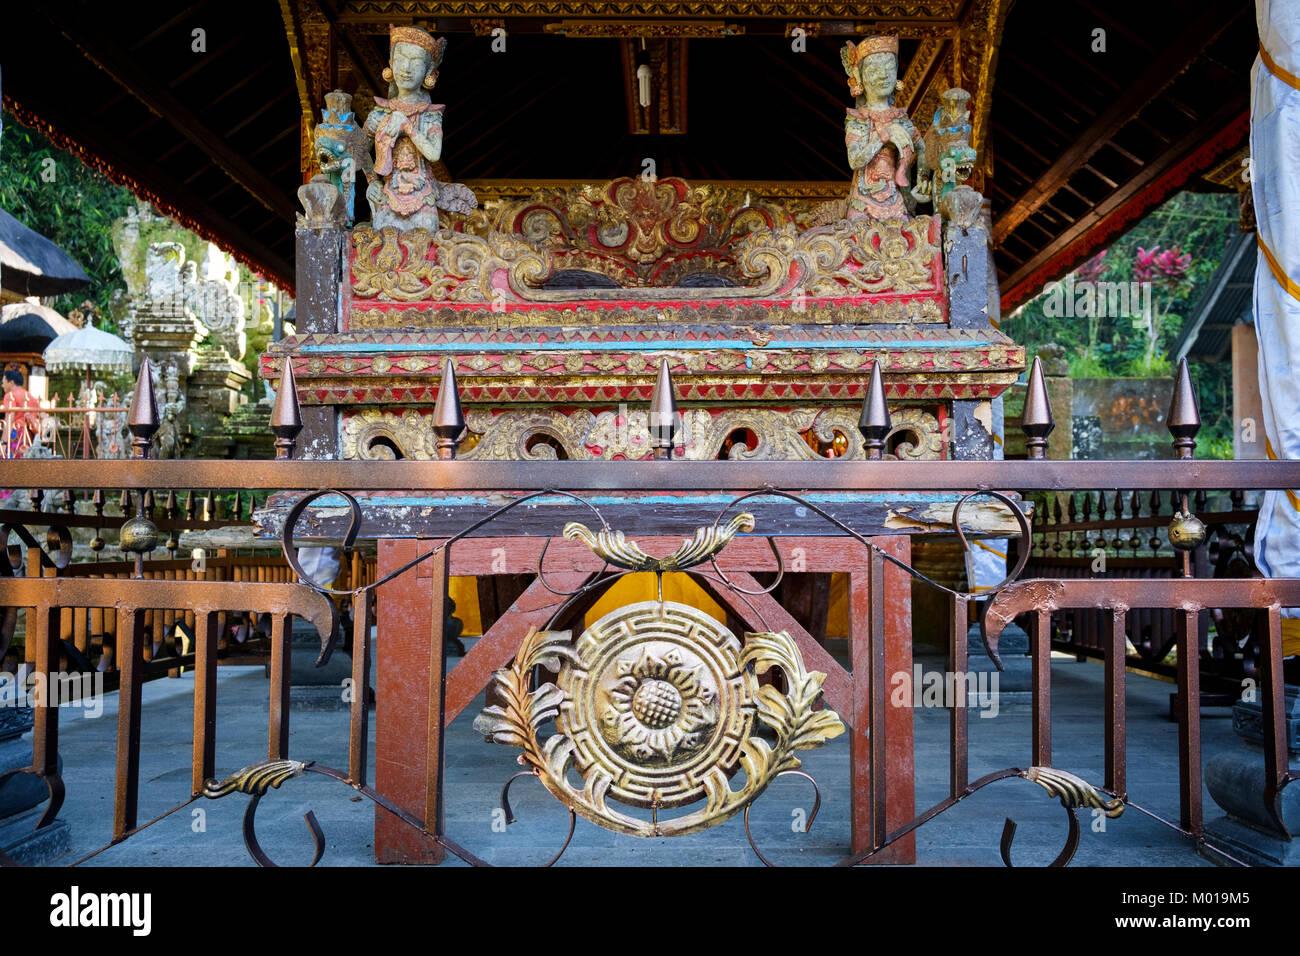 A shrine in Gunung Kawi Sebatu Temple ('Pura'), Bali, Indonesia. - Stock Image